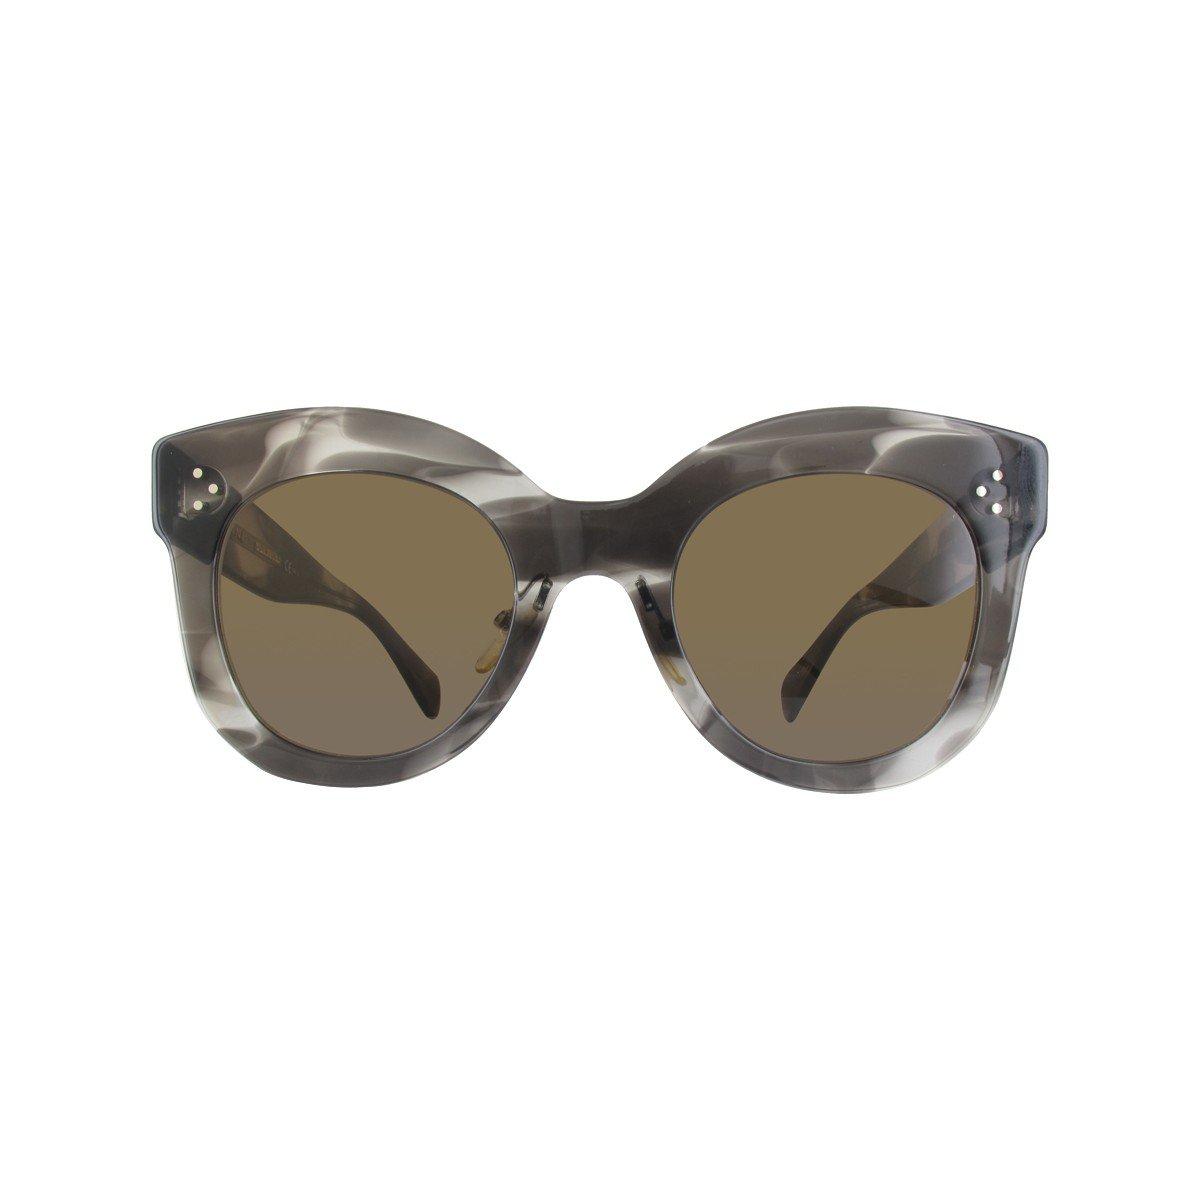 185914550e67 Celine Chris CL41443 0GQ QS Havana Grey Plastic Sunglasses Brown Lens at  Amazon Women s Clothing store